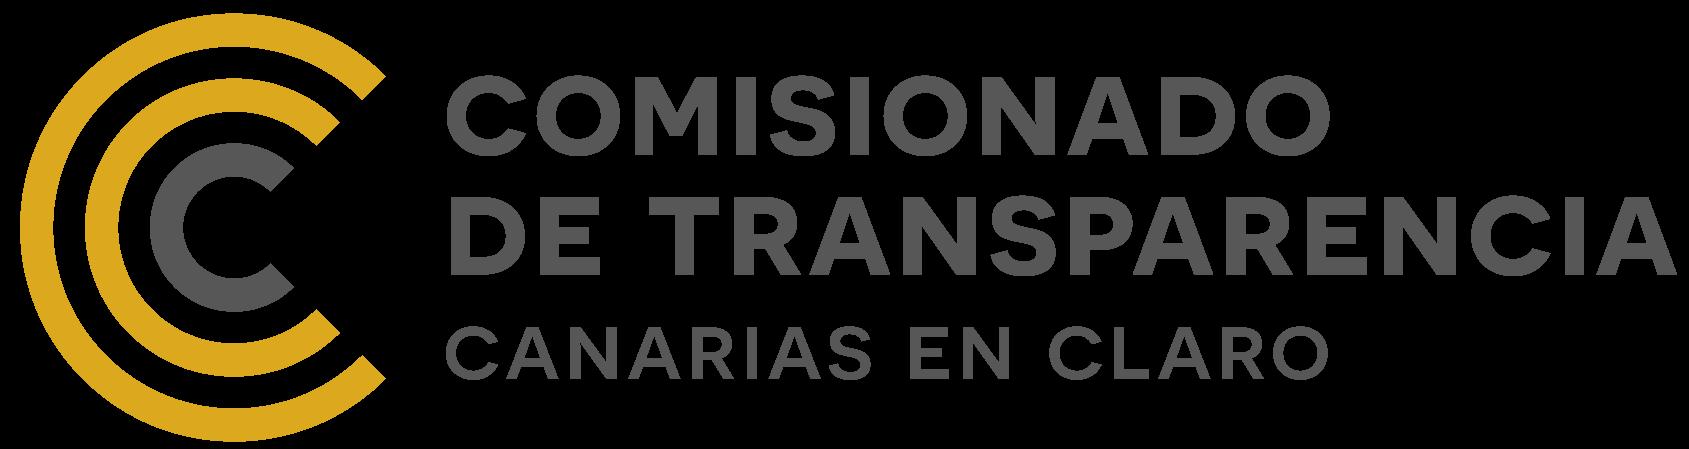 20200710152321182logocomisionadotransparencia